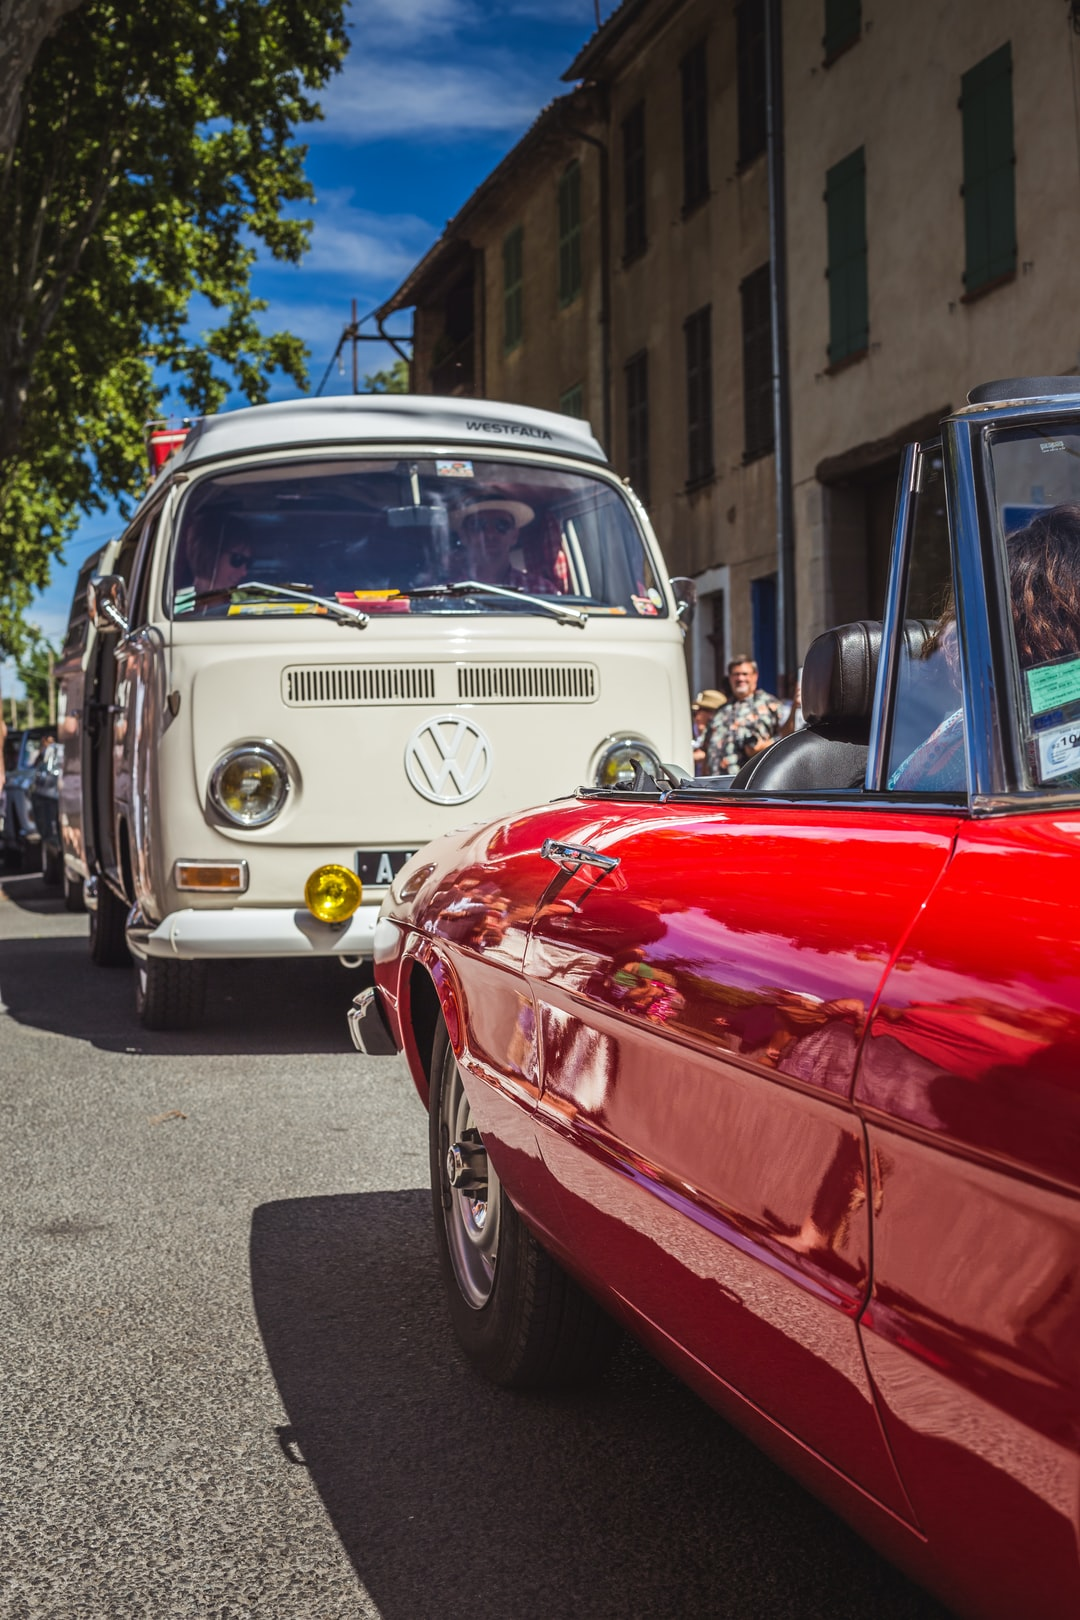 Old van volkswagen on road Nationale 7 in South of France